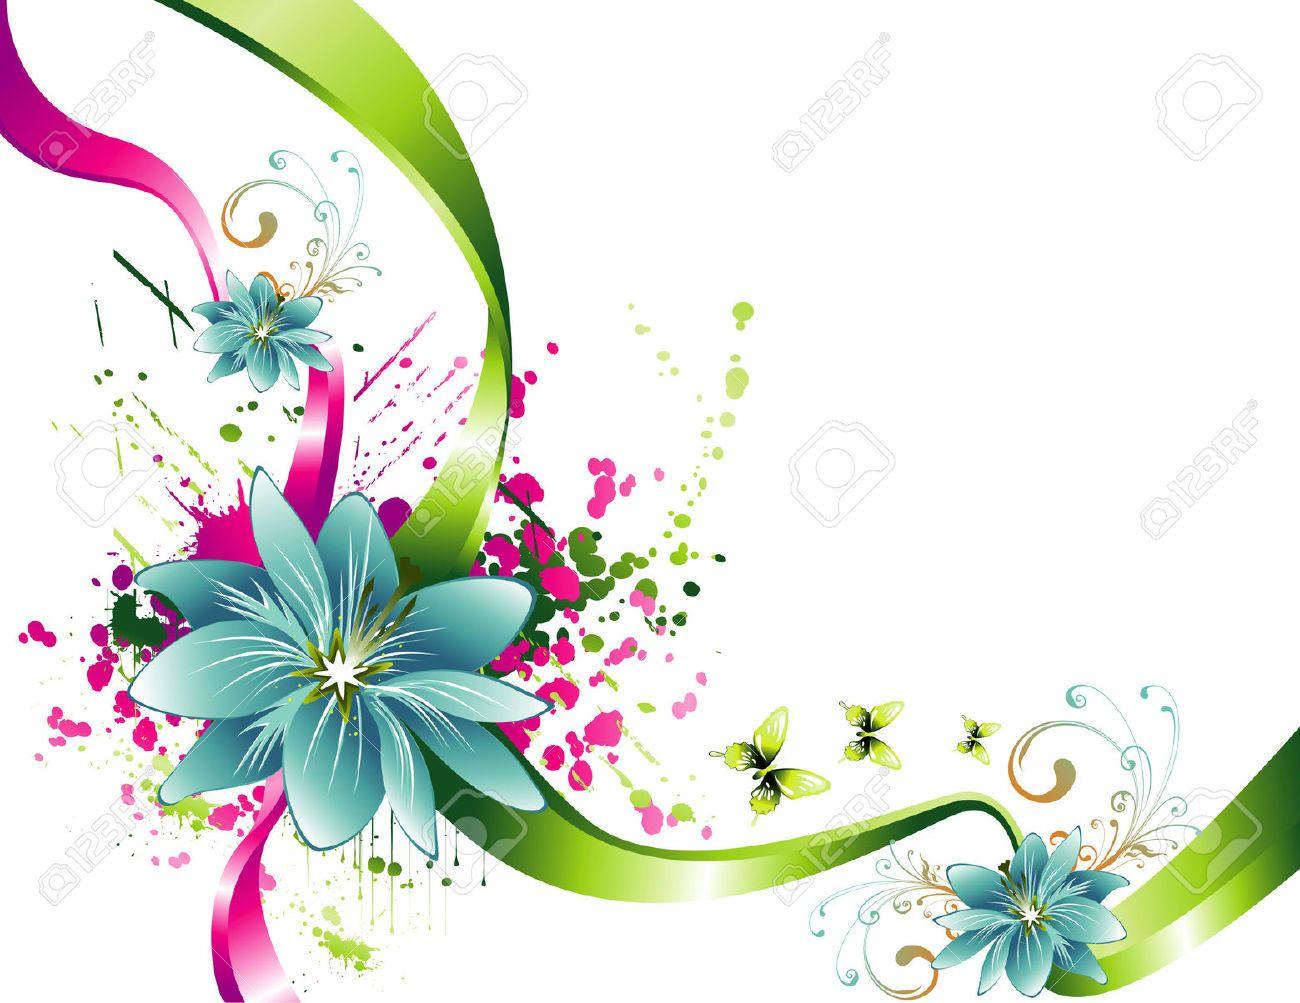 flower vector - Google Search | Floral Graphics | Pinterest ...